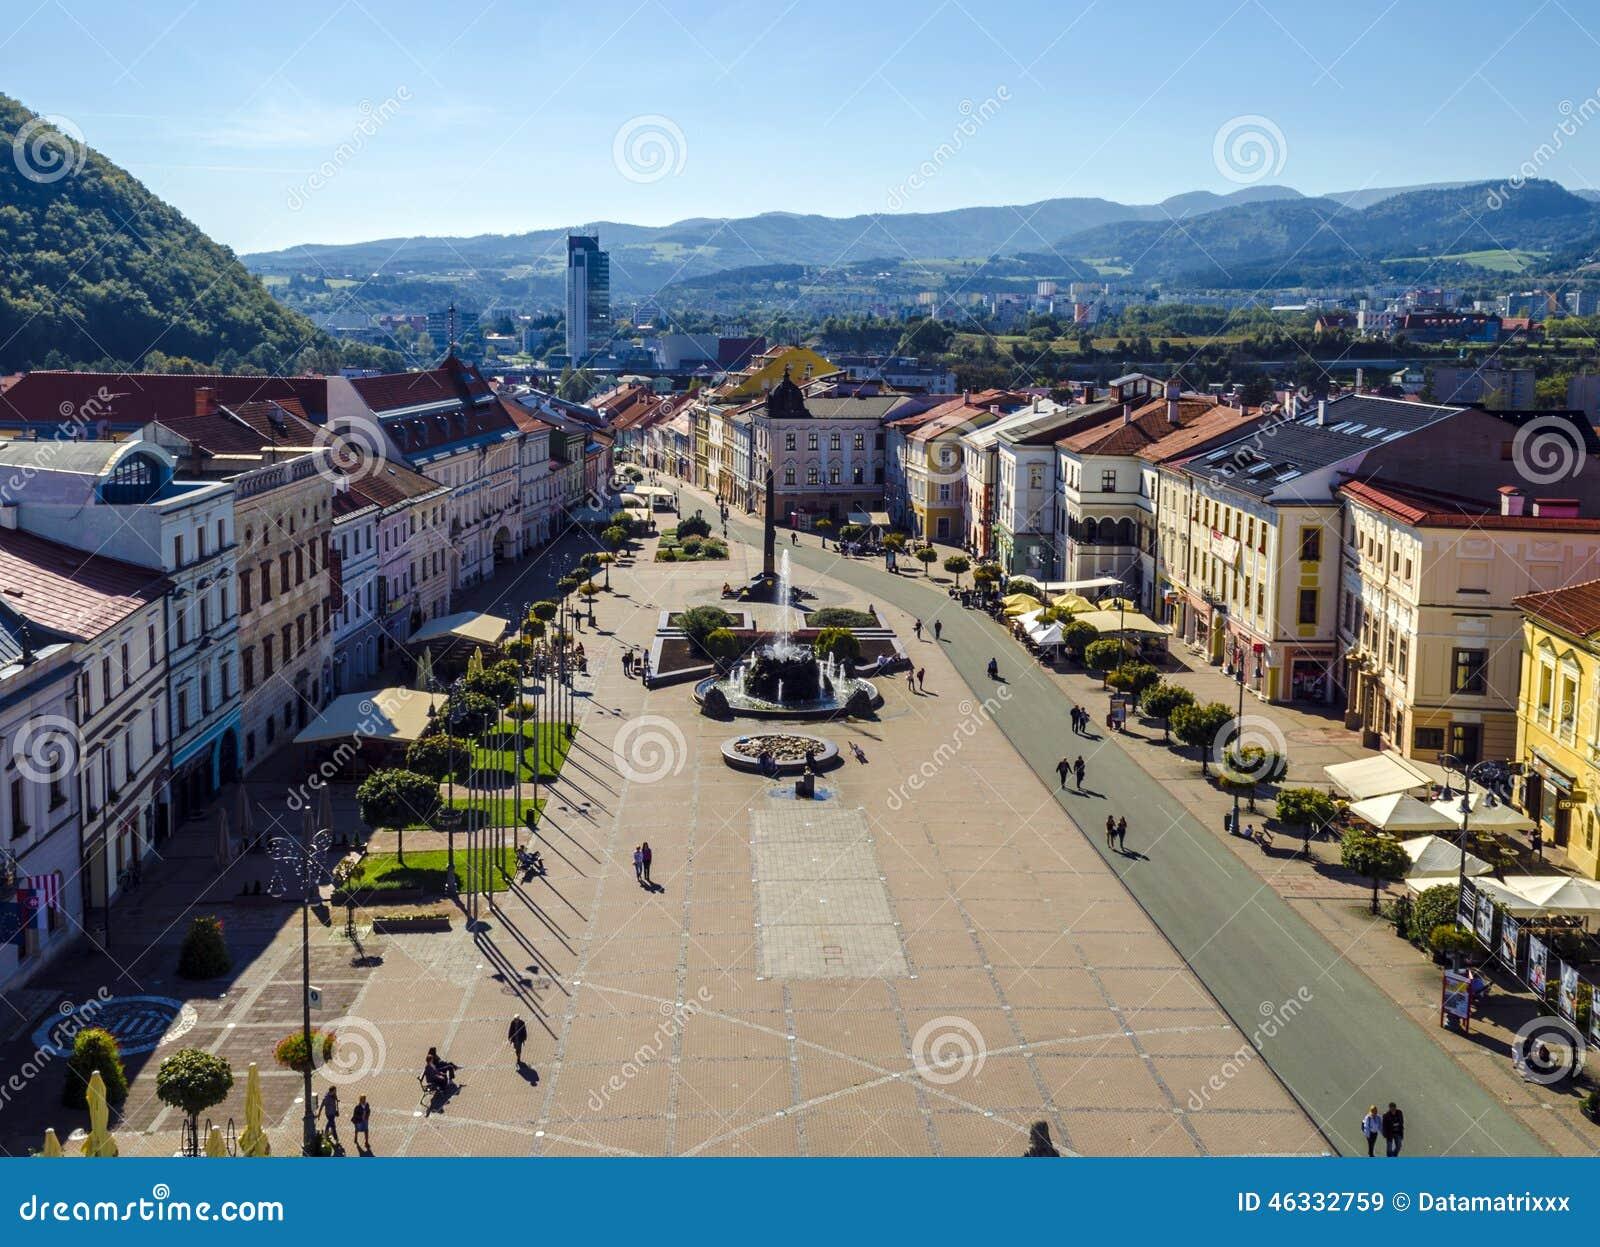 Banska Bystrica - Centrum